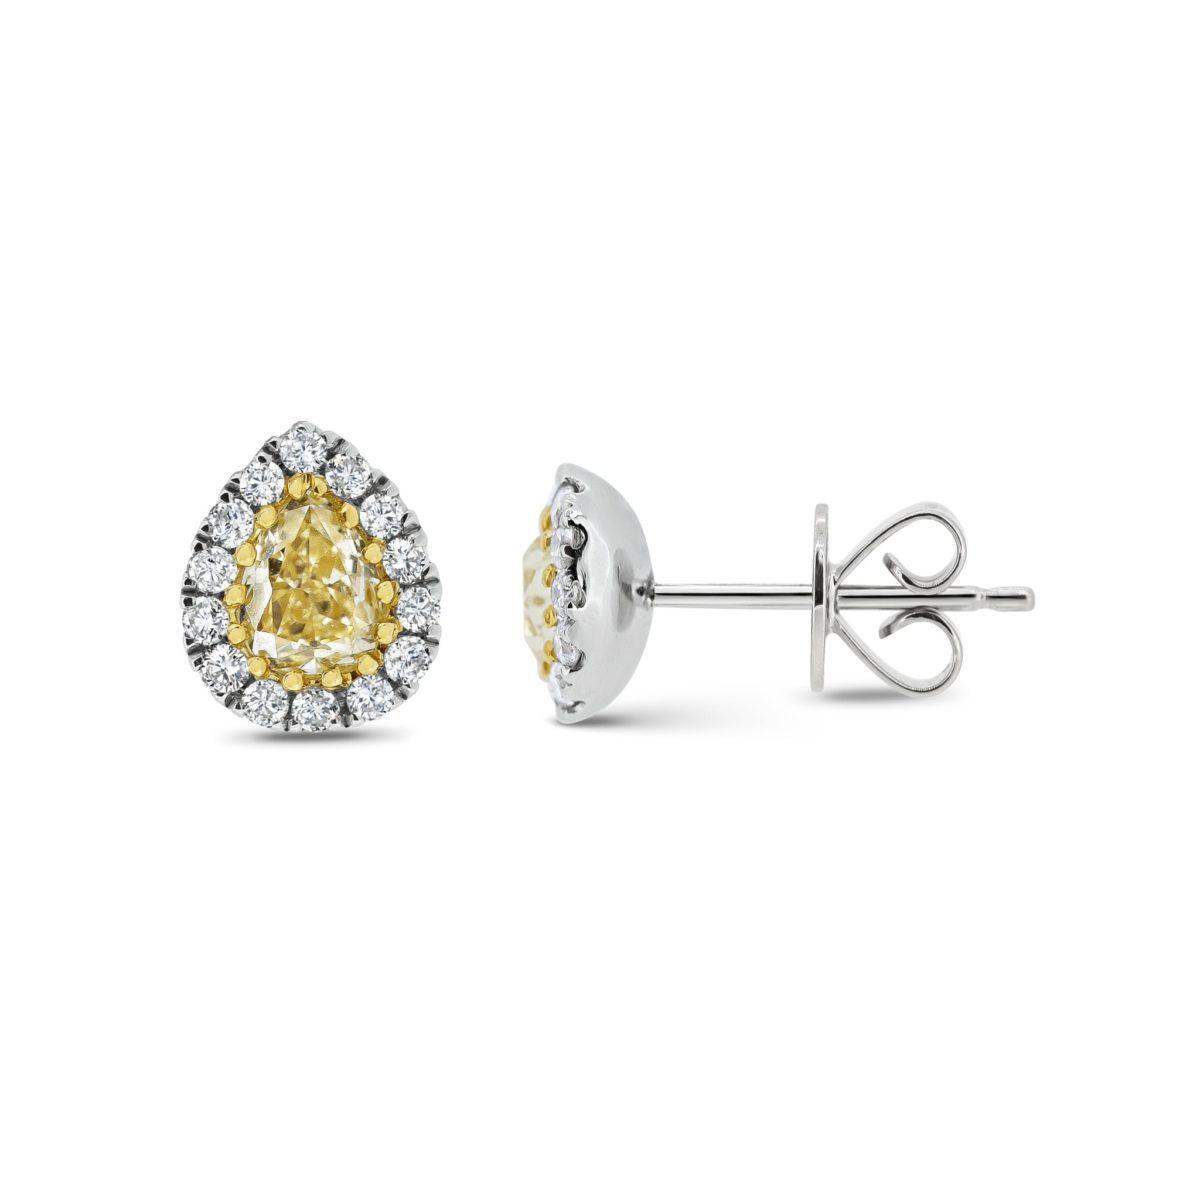 Megan Pear Cut Natural Fancy Intense Yellow Diamond Halo Earrings